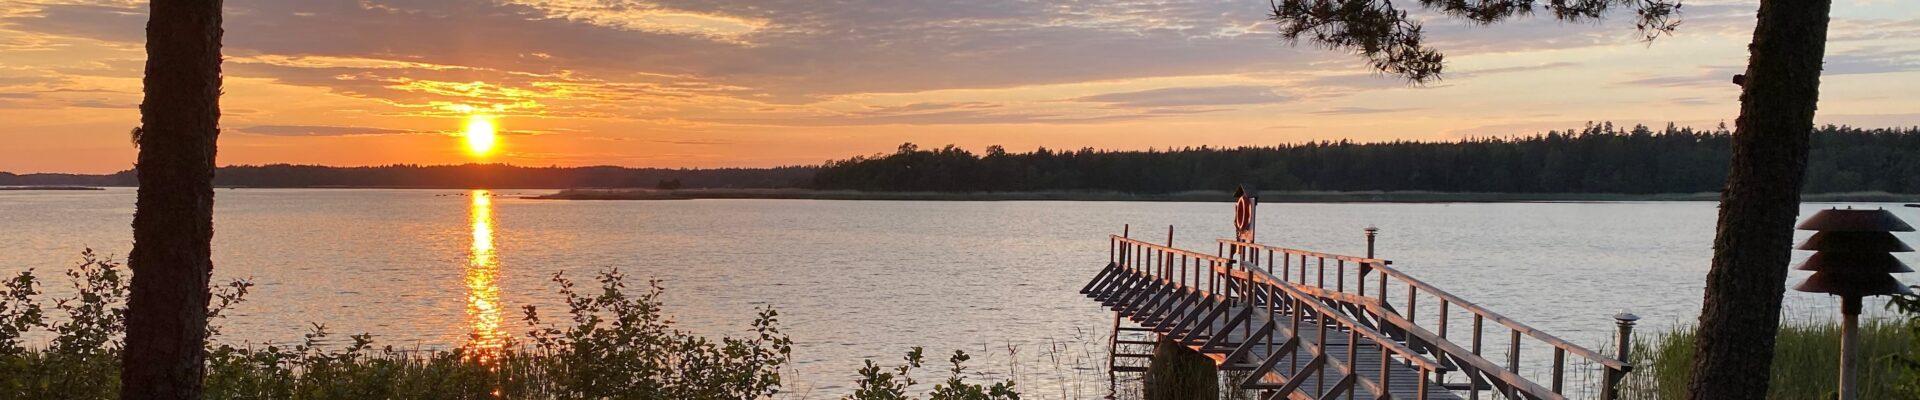 Meetings and saunas at seaside_Merikoivula